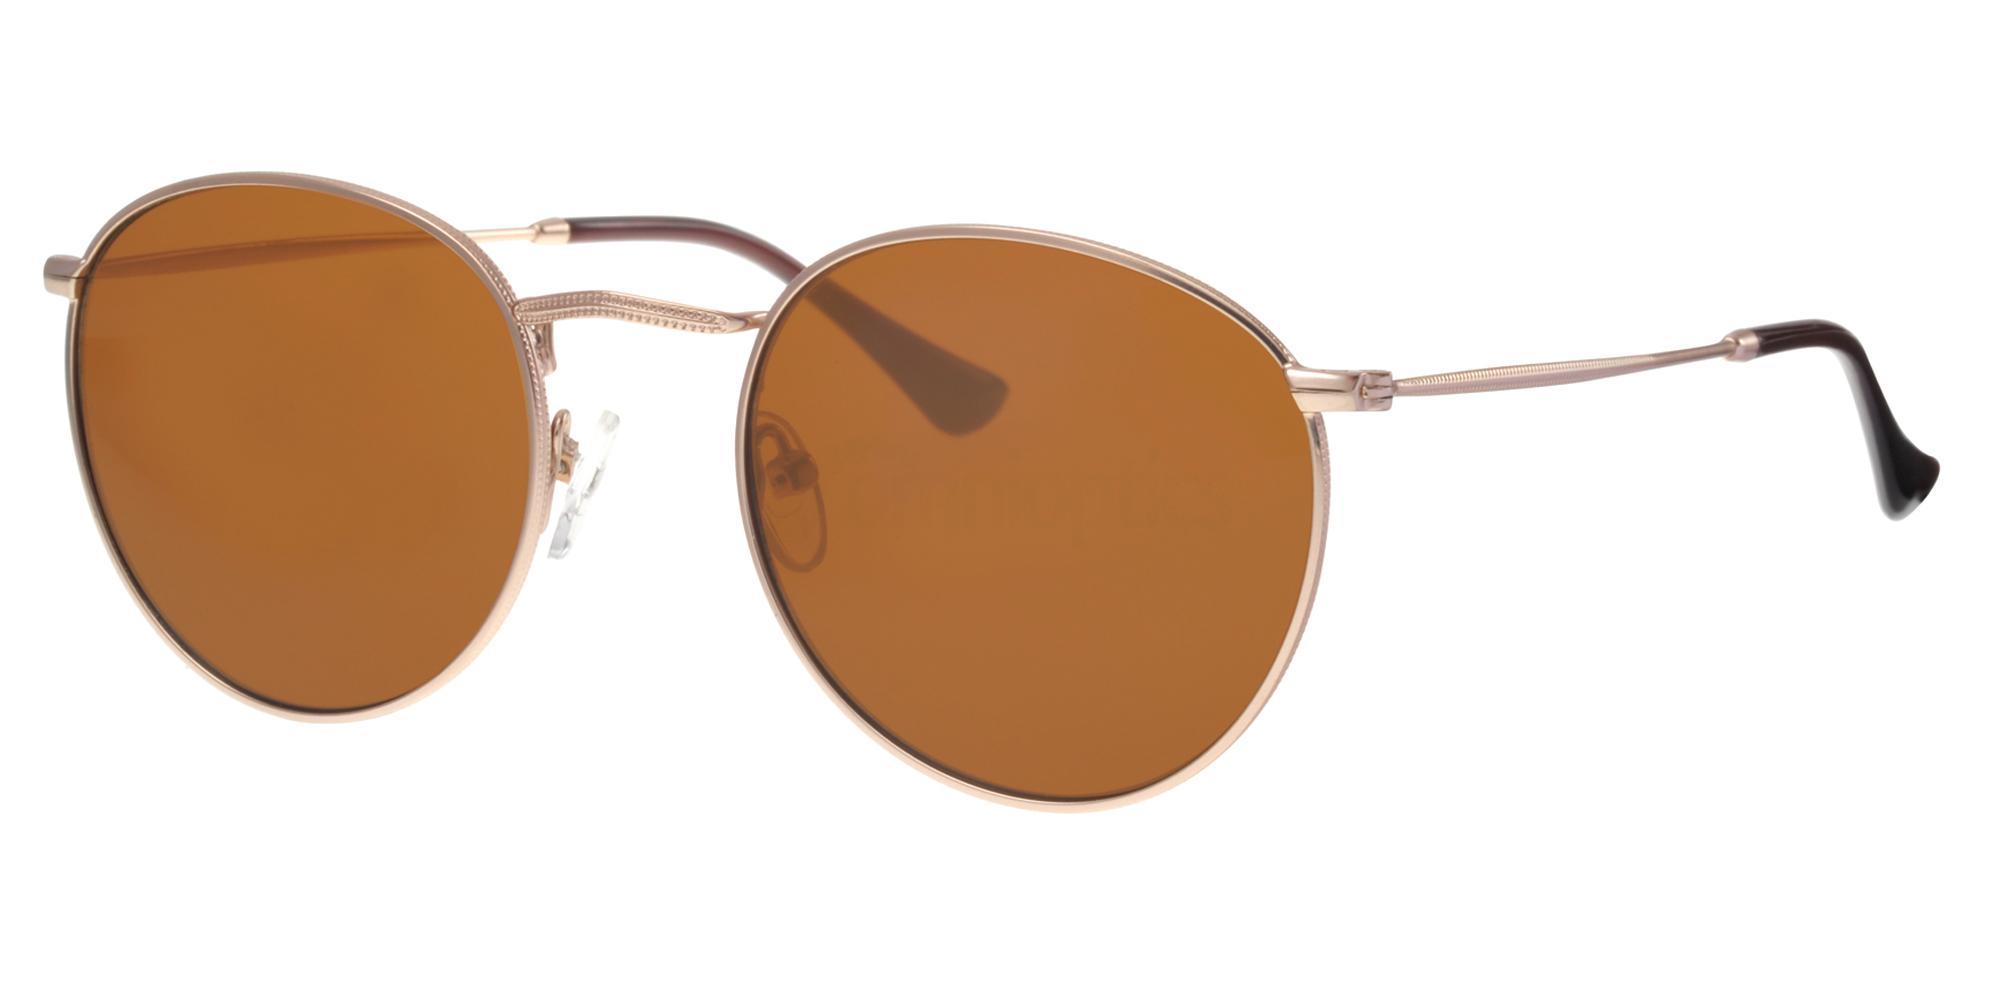 C01 VS195 Sunglasses, Visage